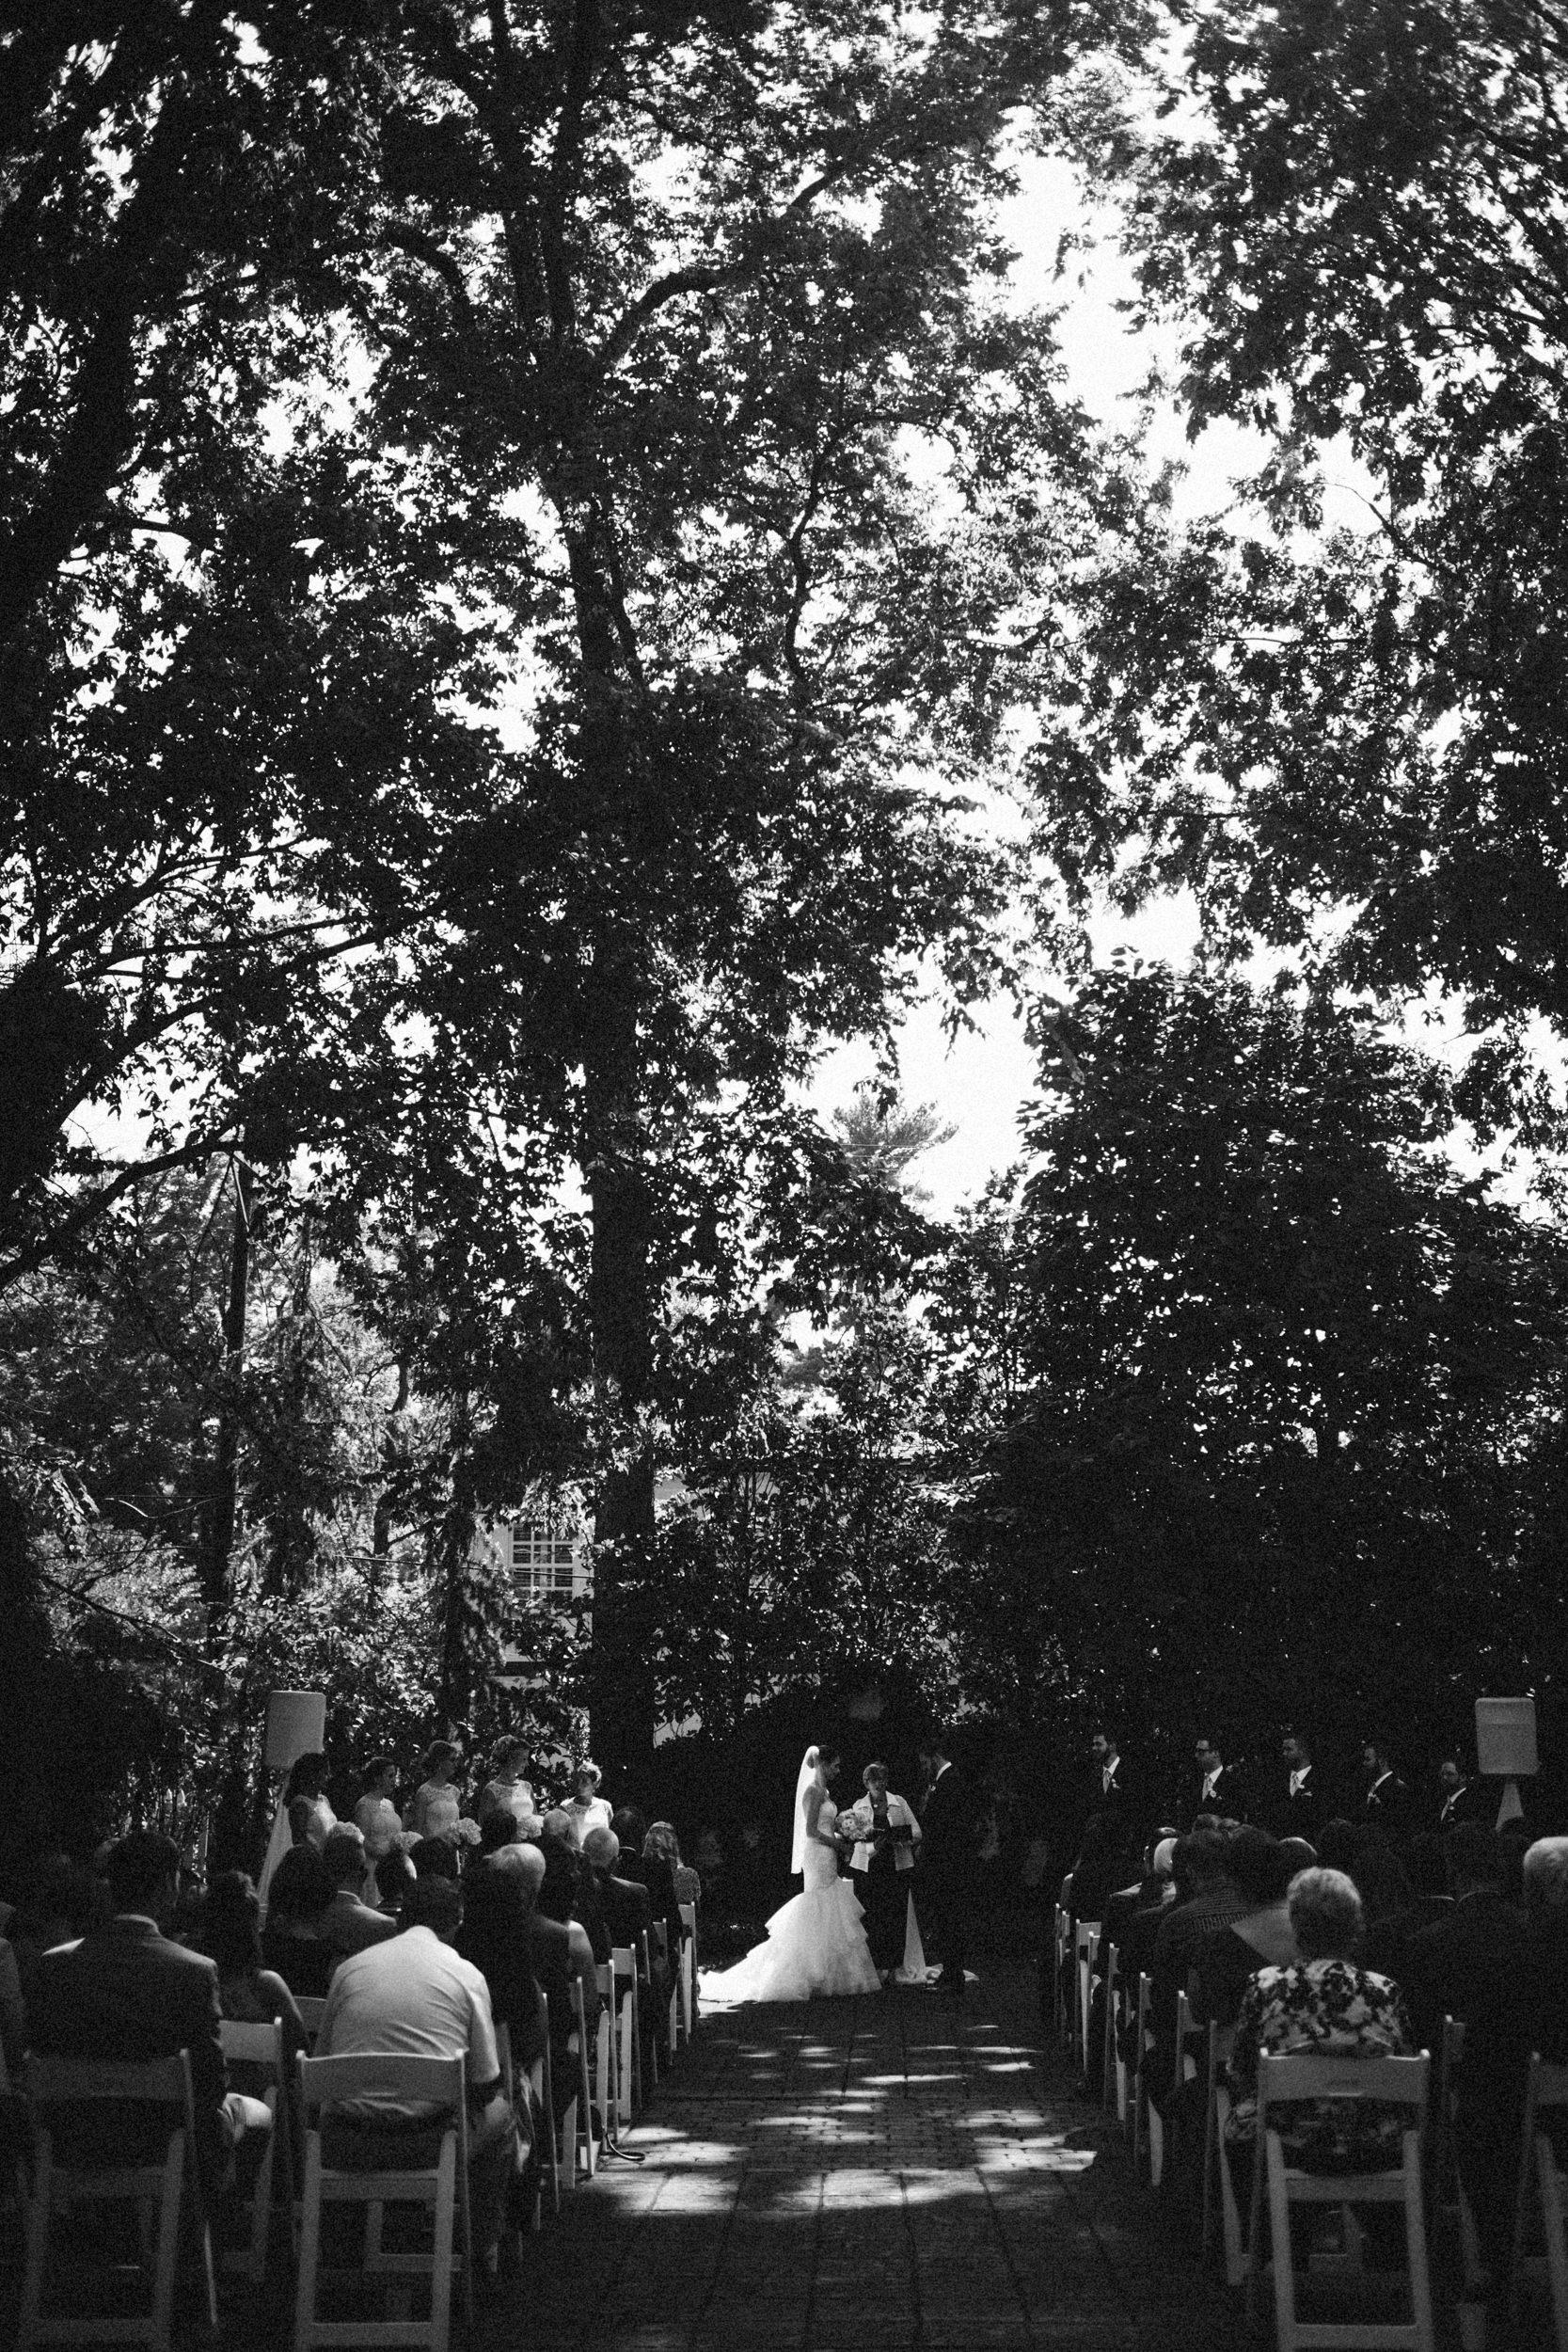 Louisville-Kentucky-Wedding-Elopement-Photographer-Sarah-Katherine-Davis-Photography-Whitehall-Classic-Timeless-Garden-Wedding-341.jpg